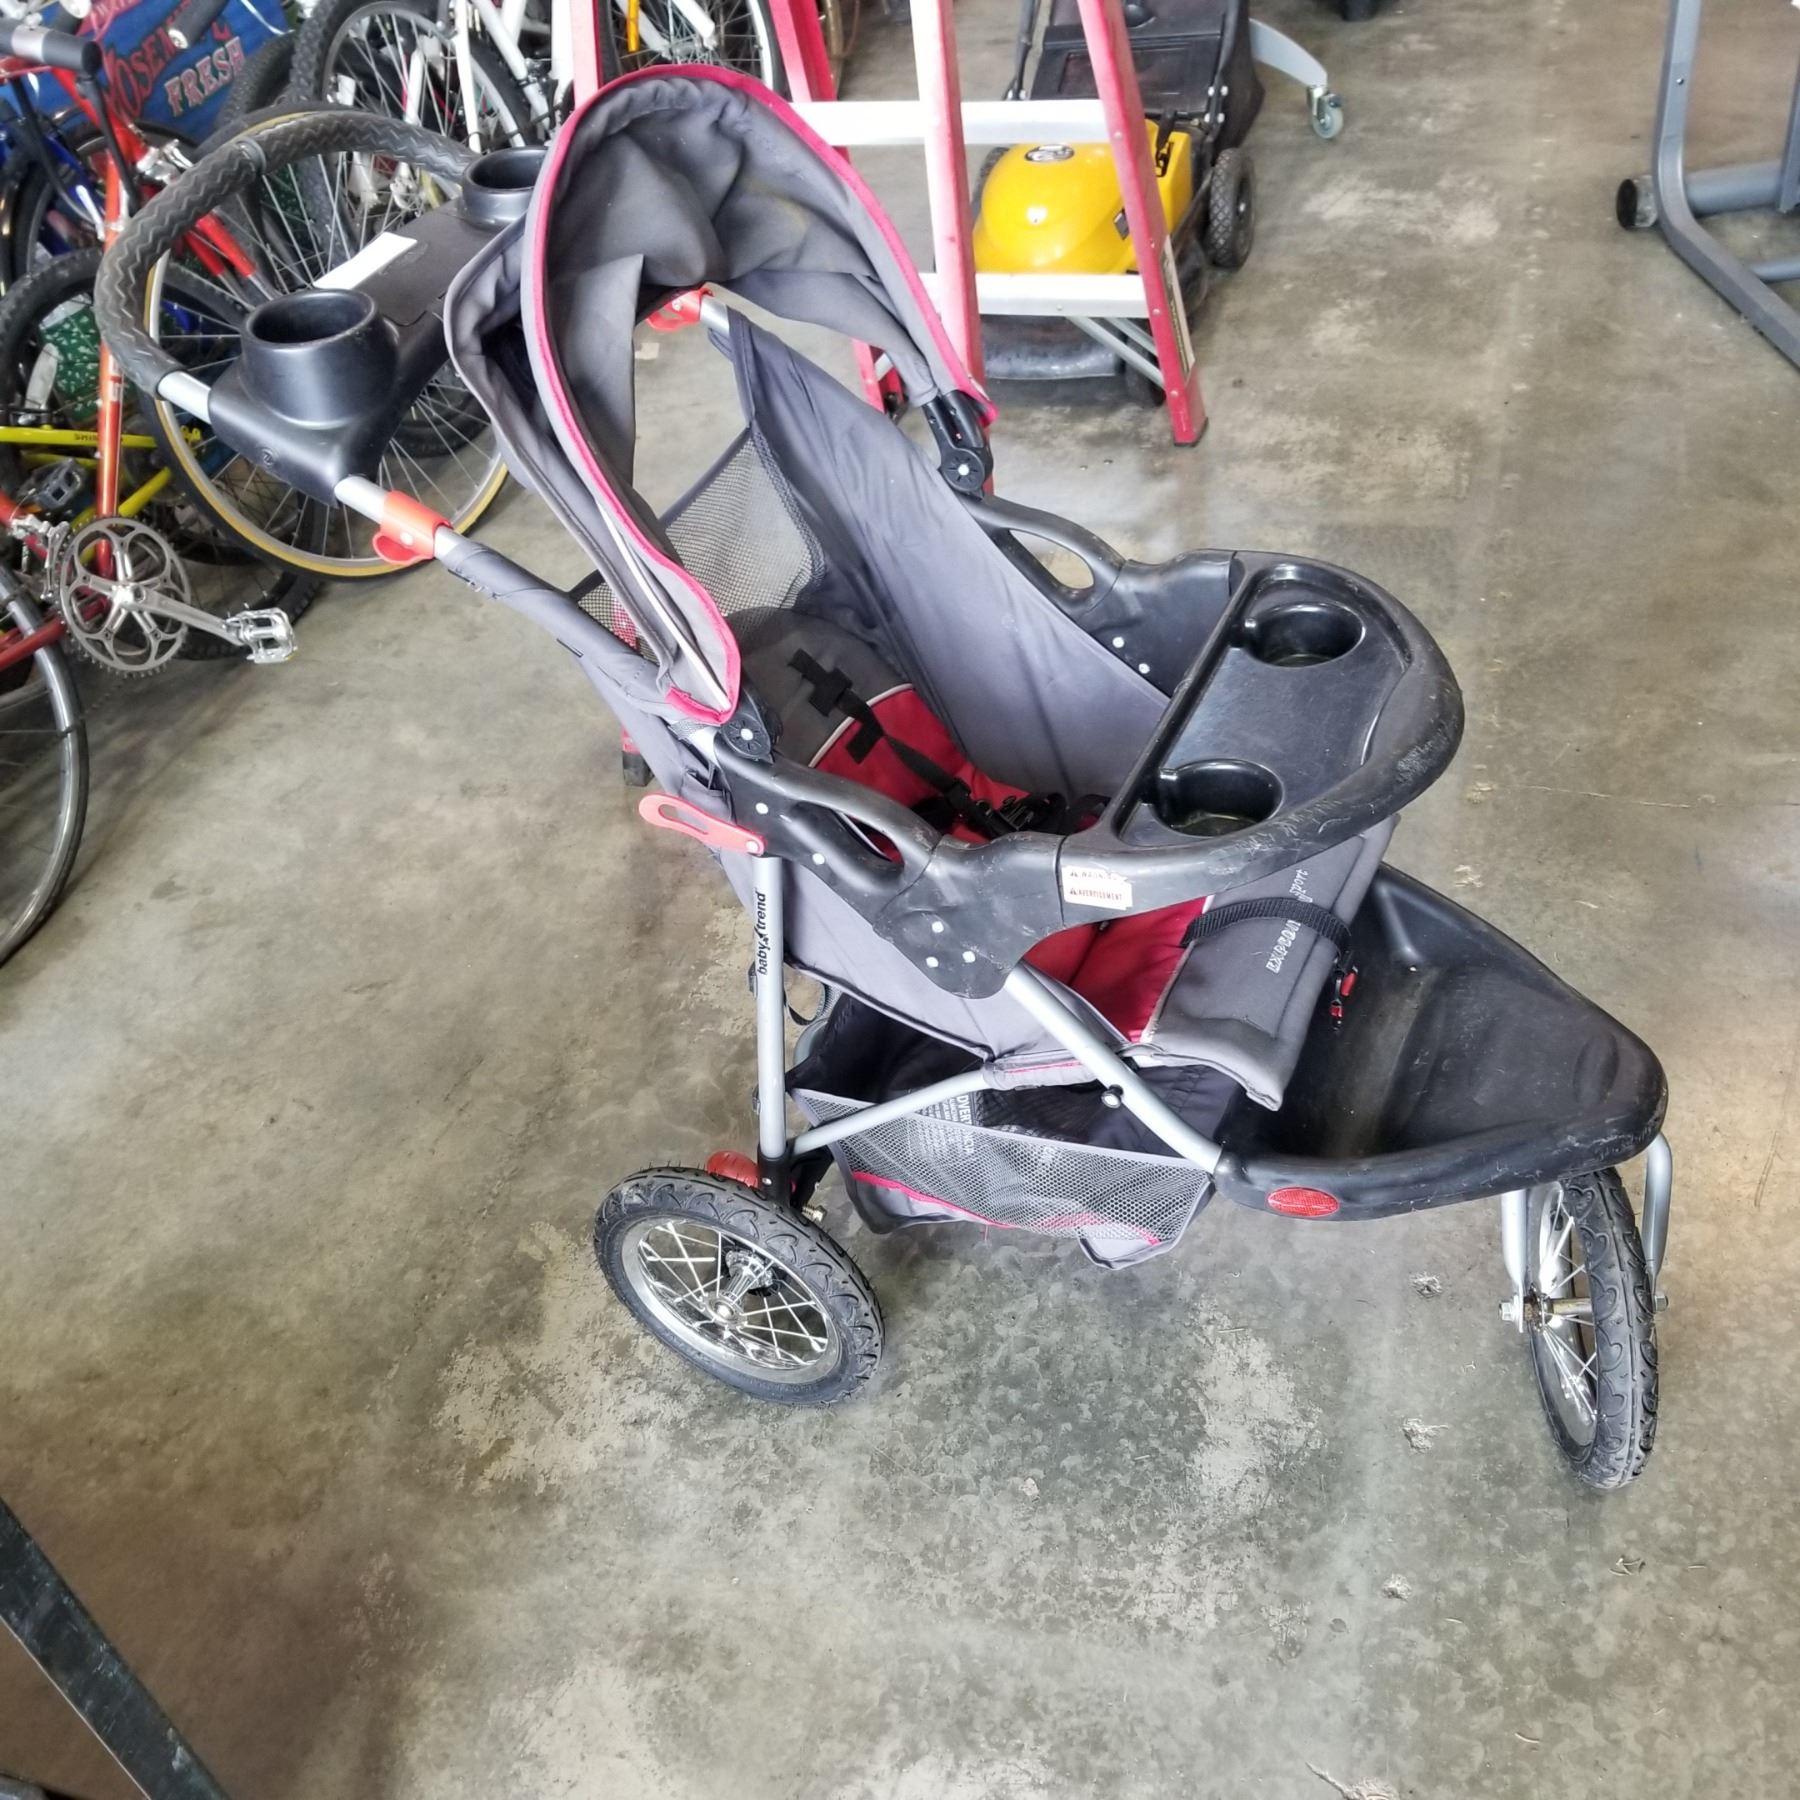 BABY TREND JOGGING STROLLER - Big Valley Auction